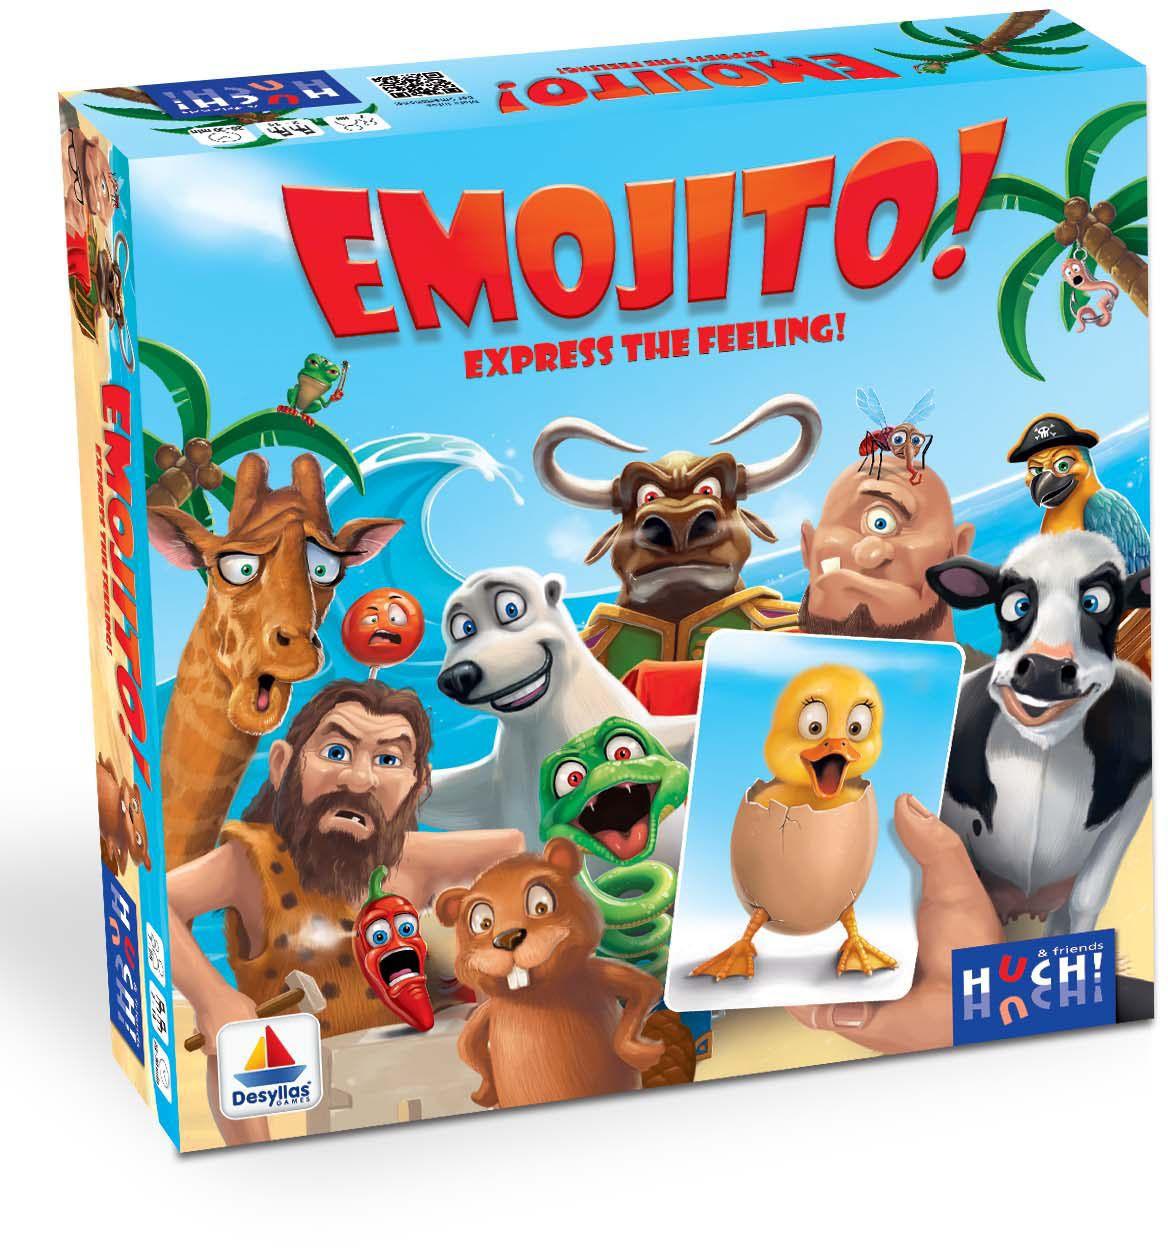 HUCH FRIENDS Huch! & friends Brettspiel, »Emojito«